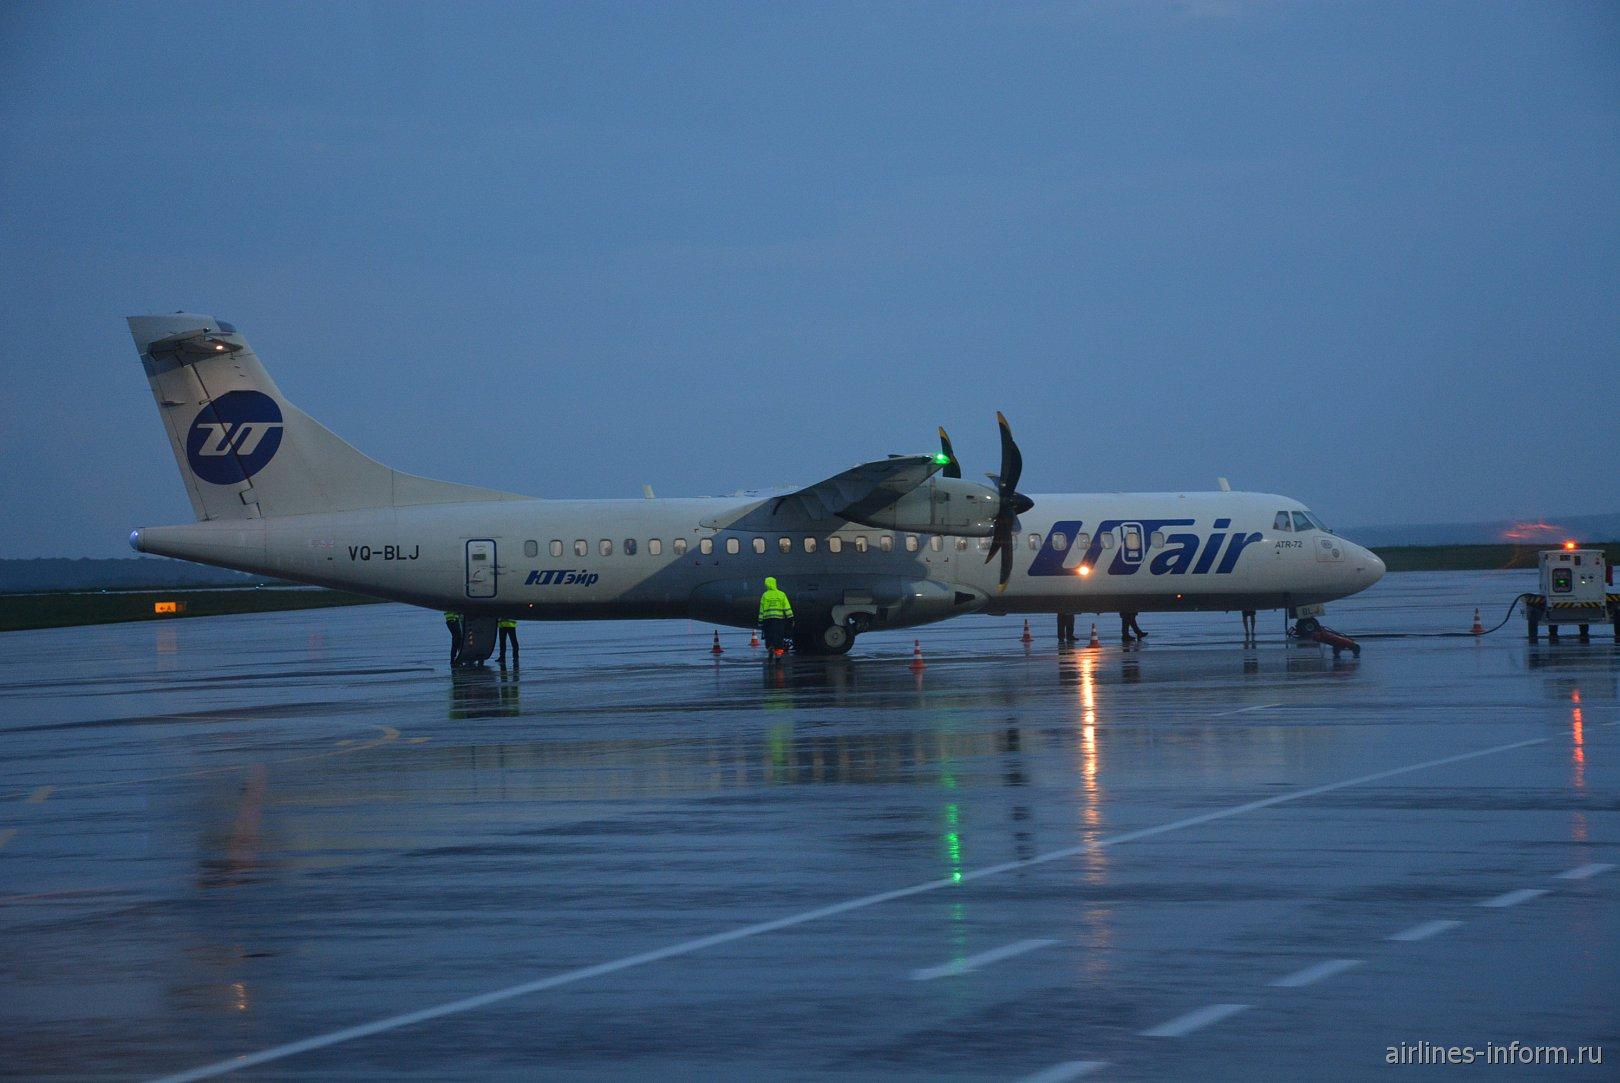 Самолет ATR-72 VQ-BLJ авиакомпании Utair в аэропорту Калуги